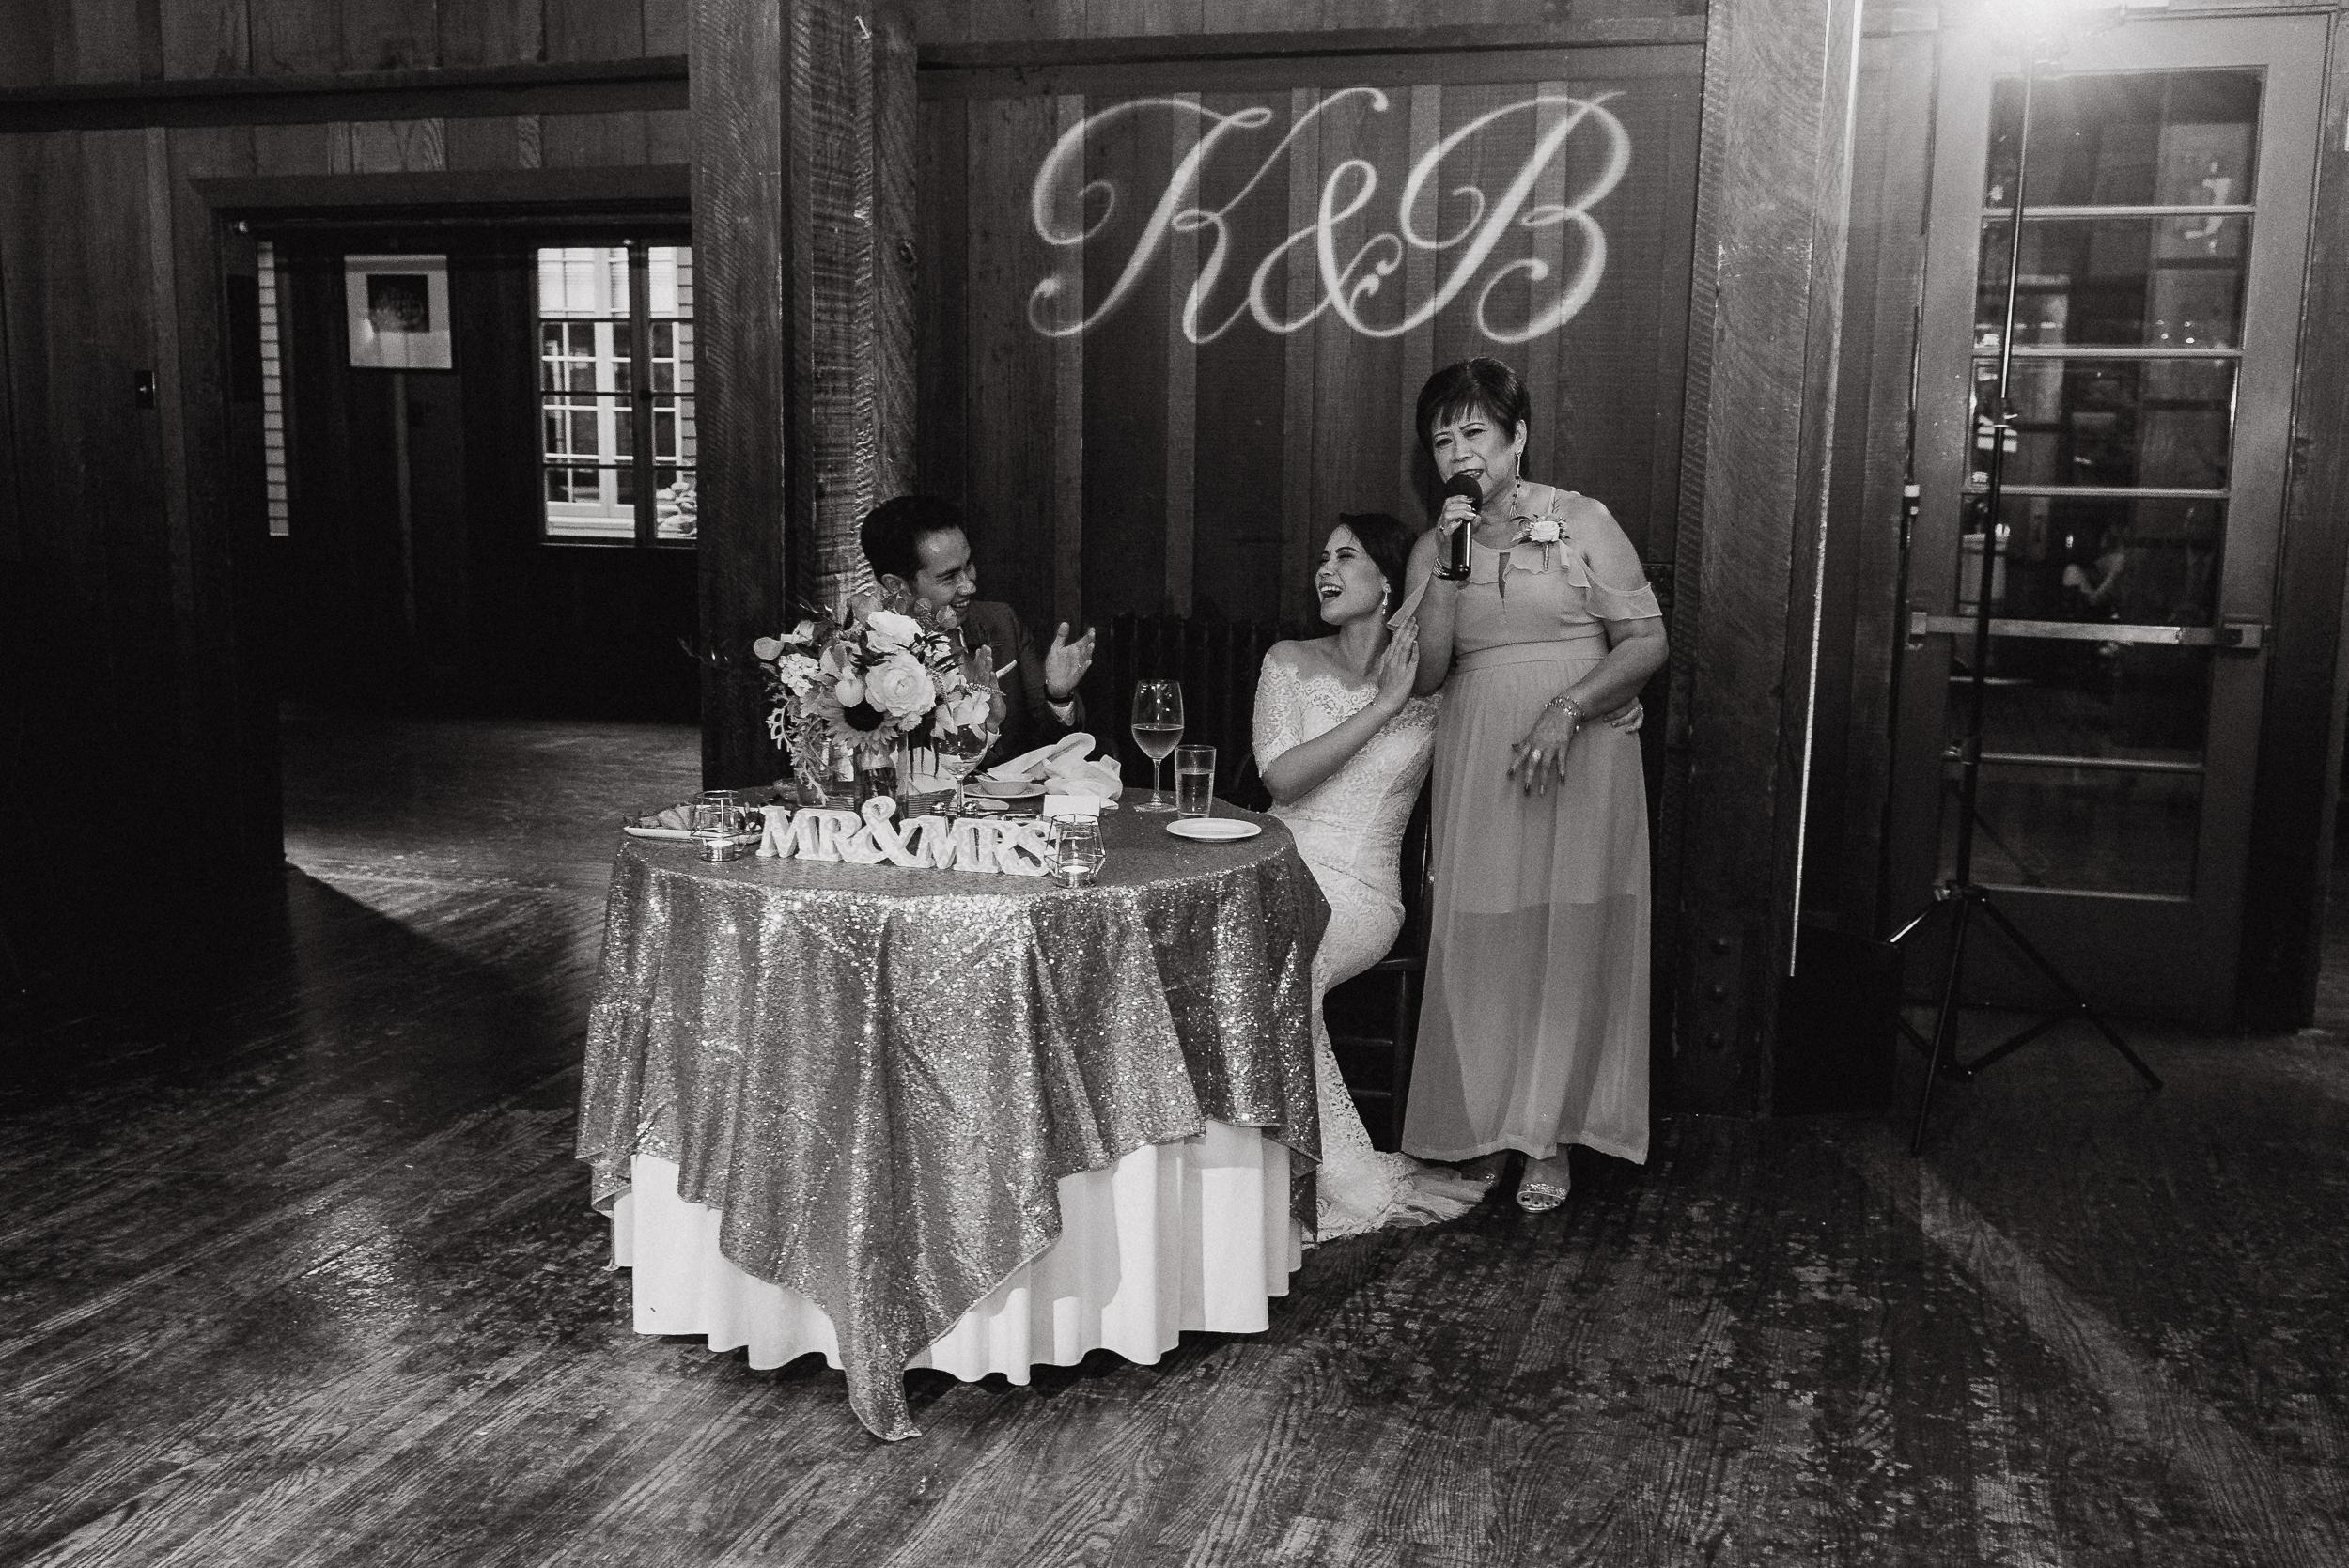 68-berkeley-uc-faculty-club-wedding-kb-vivianchen-429.jpg